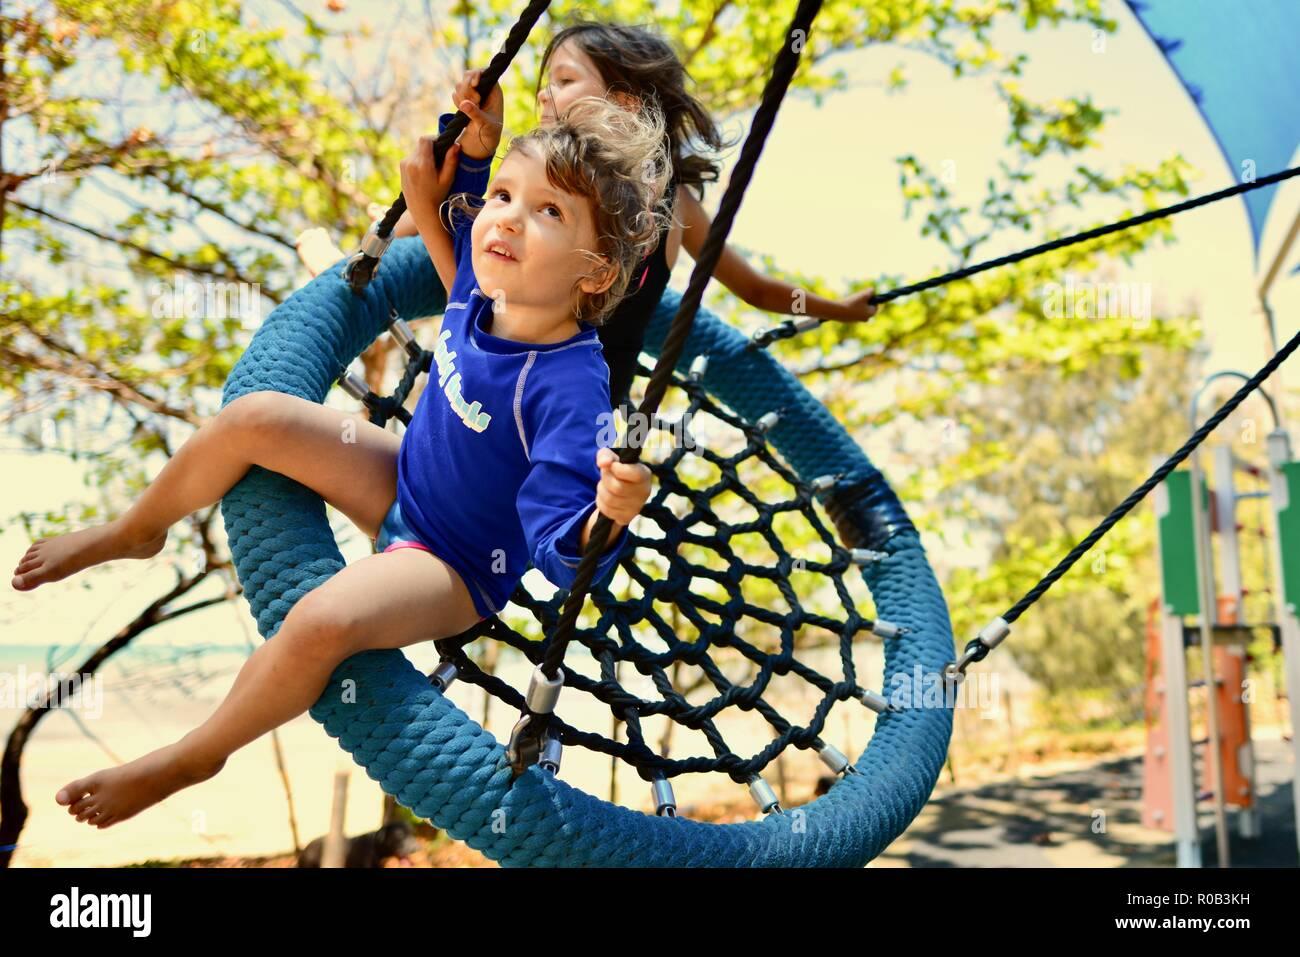 Two children playing on a nest swing, Balgal beach, QLD, Australia Stock Photo